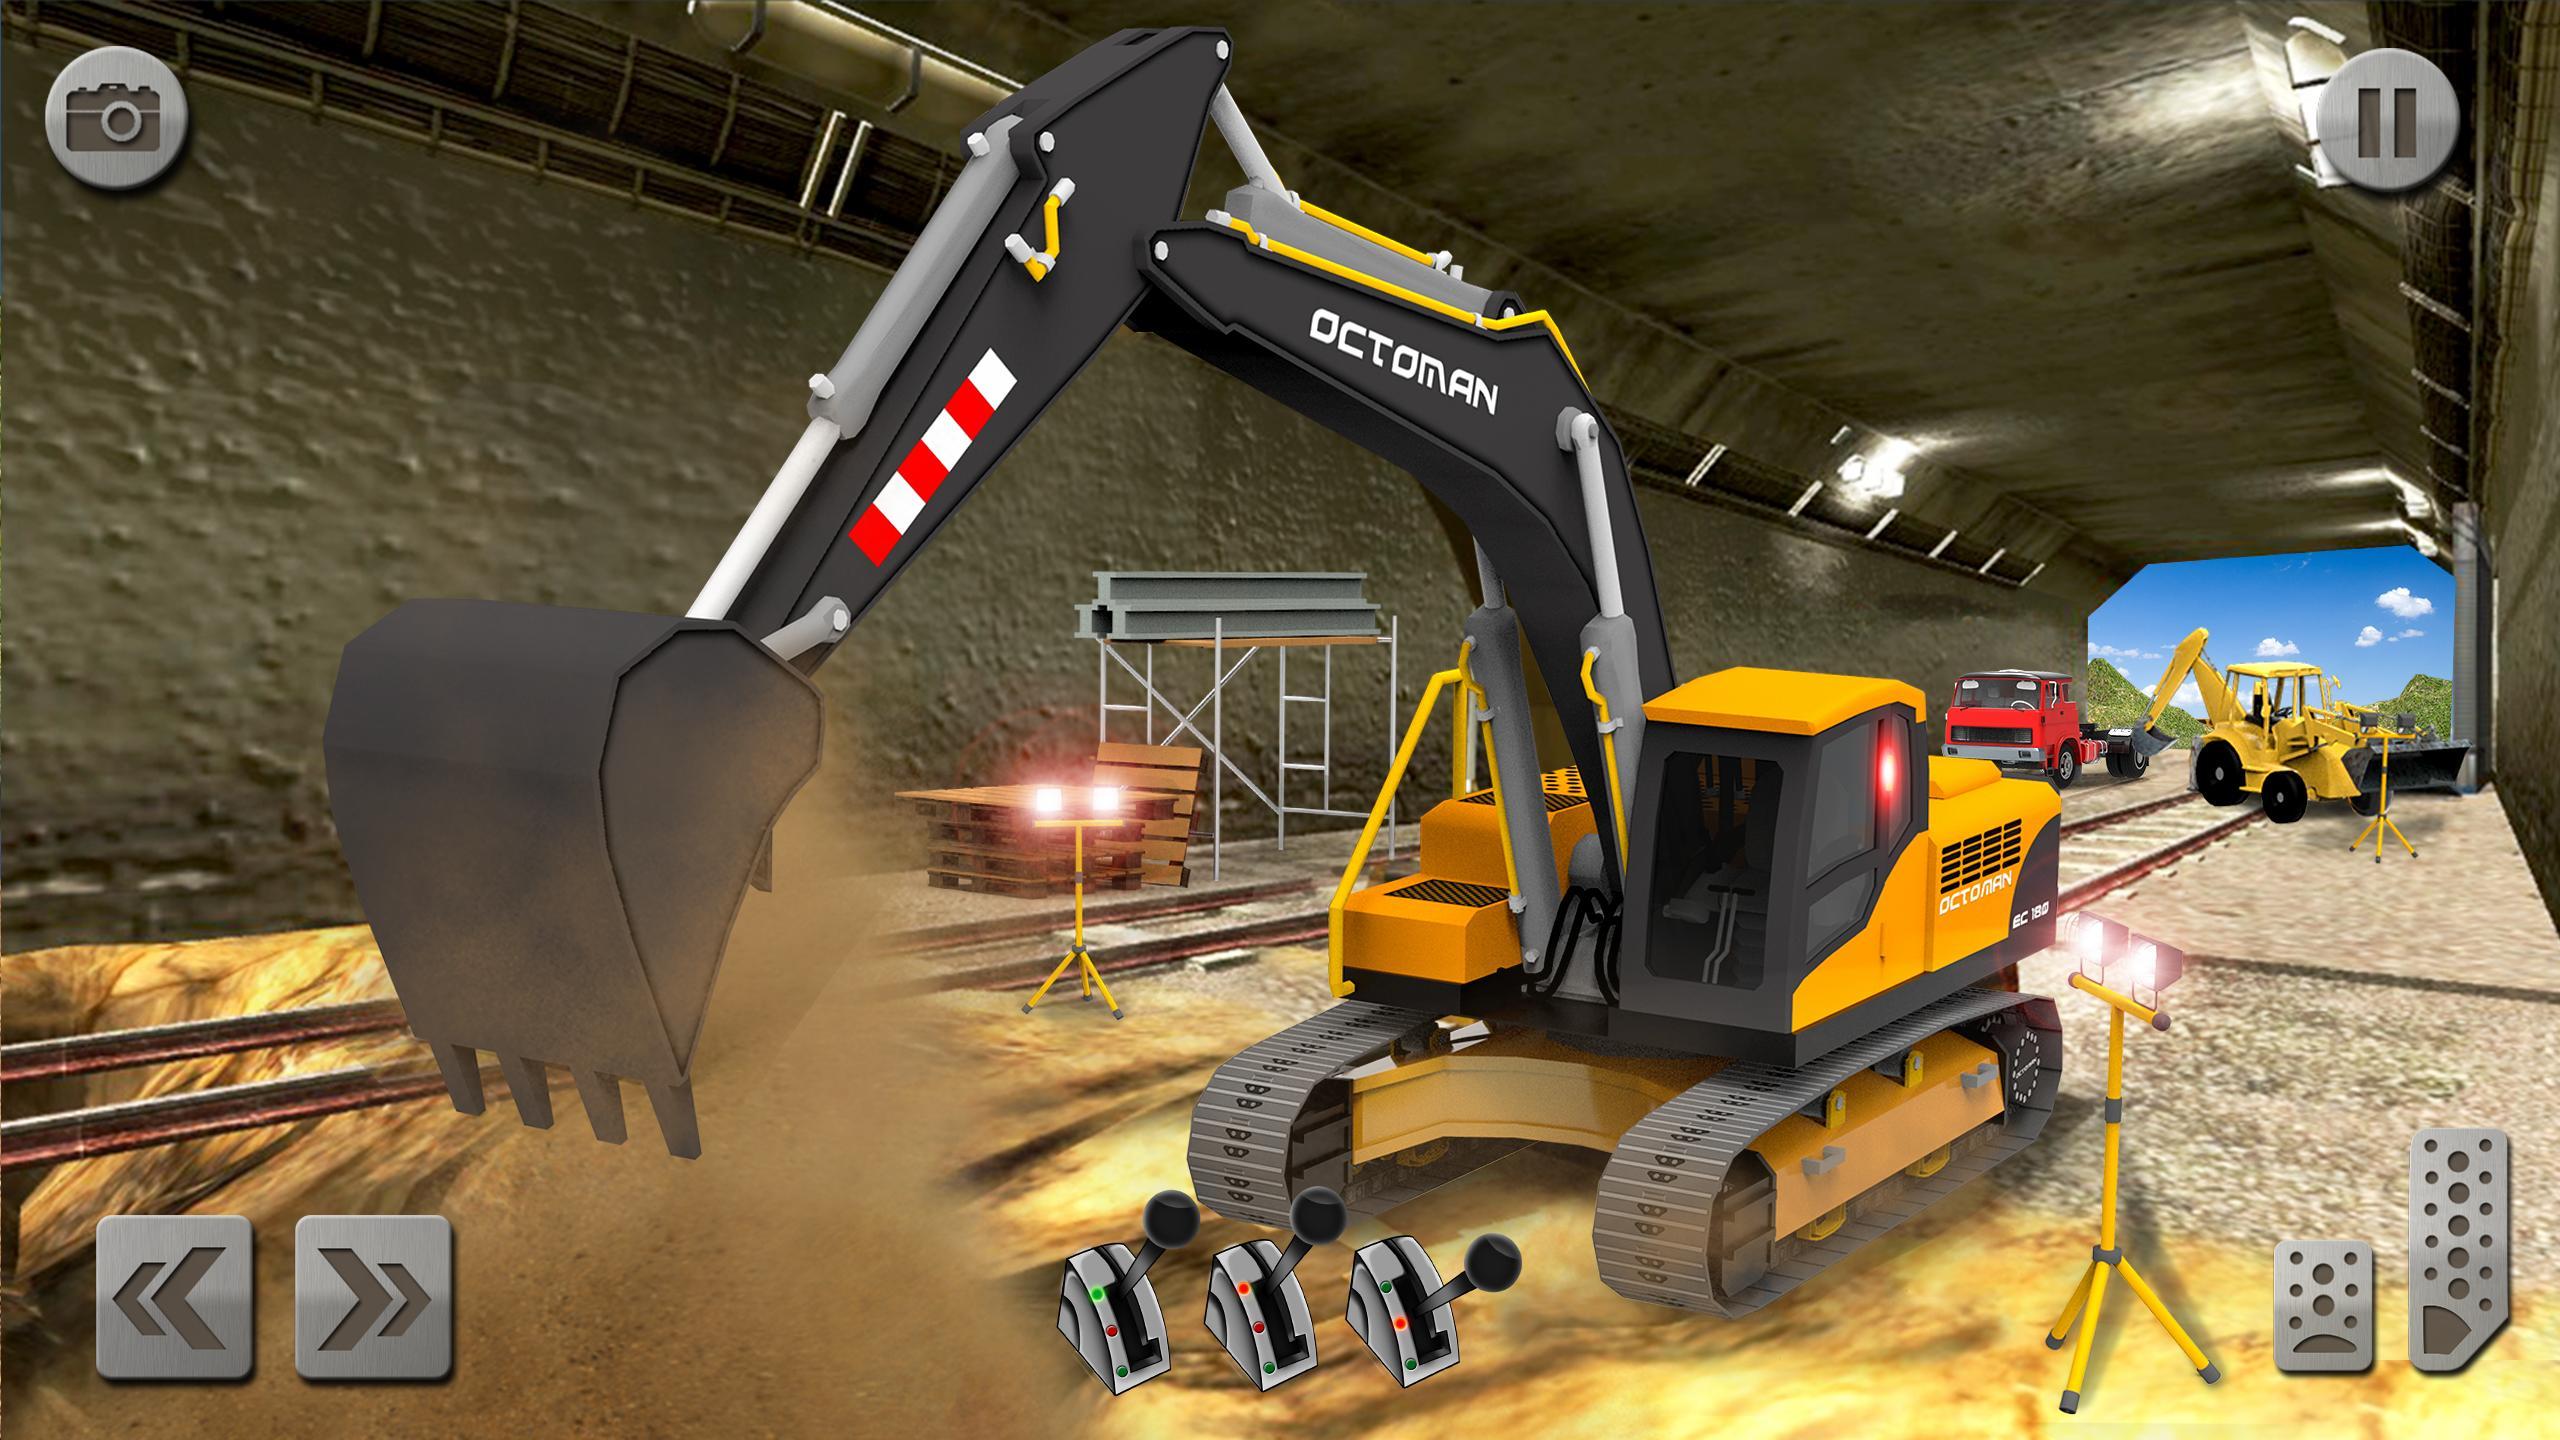 Sand Excavator Truck Driving Rescue Simulator game 5.2 Screenshot 16